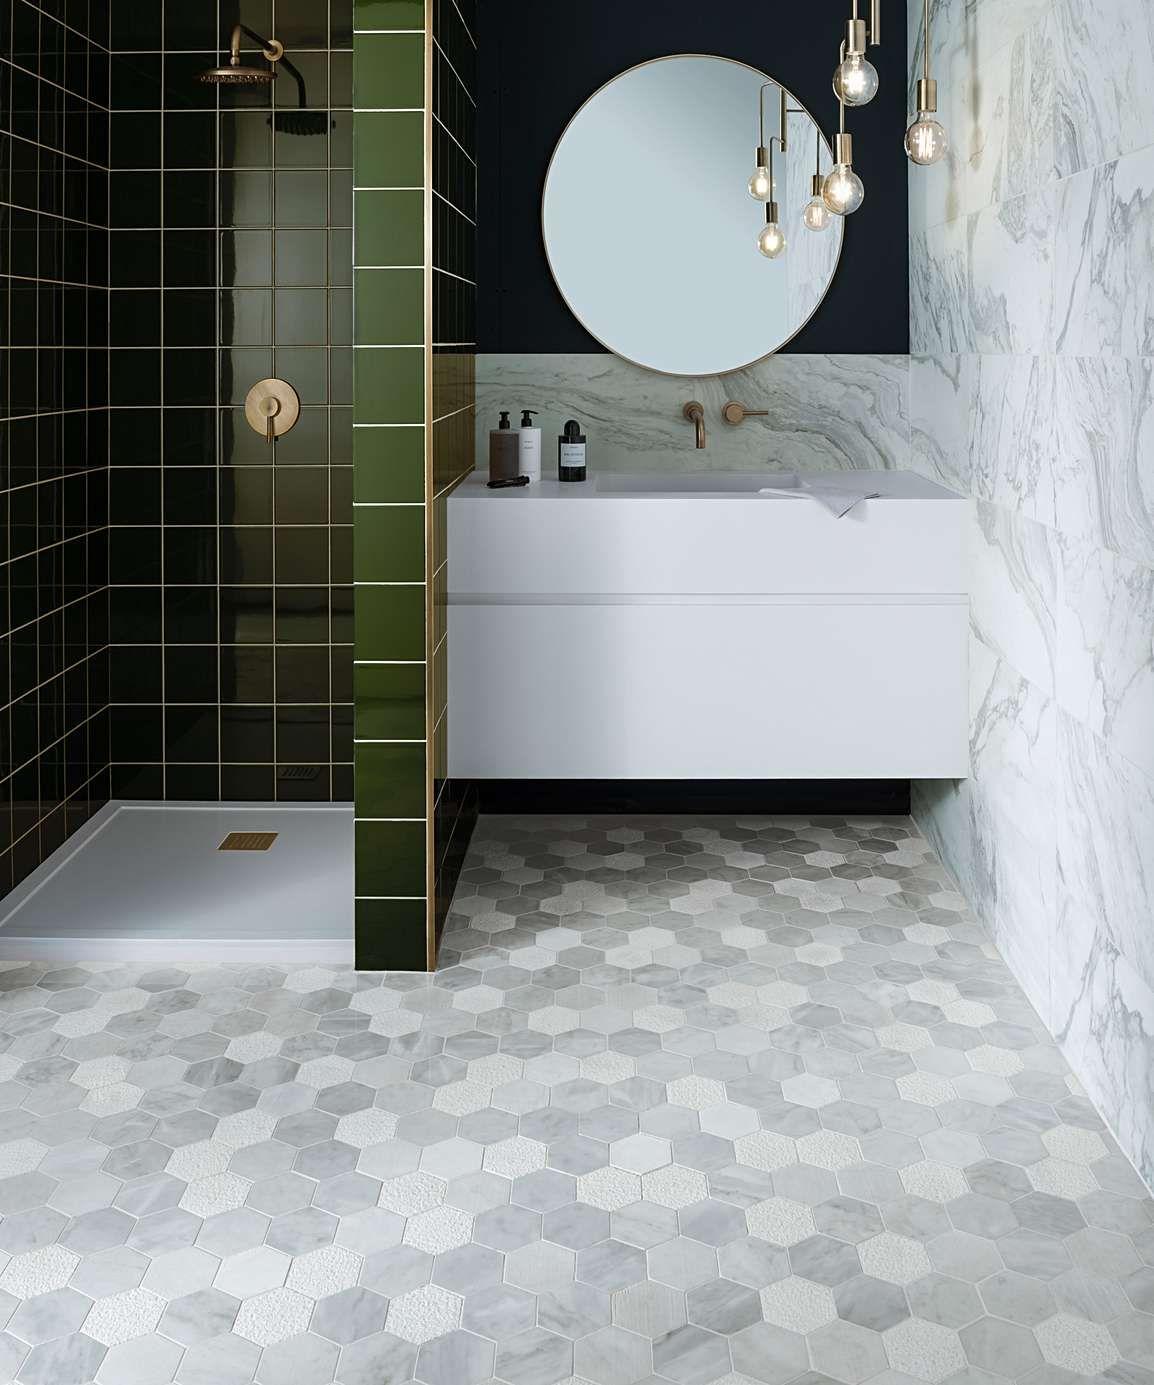 Https Thumbor Gc Tomandco Uk Unsafe 1154x1385 Center Middle Smart Filters Upscale Fill White Sha Mosaic Bathroom Tile Carrara Mosaics Bathroom Floor Tiles